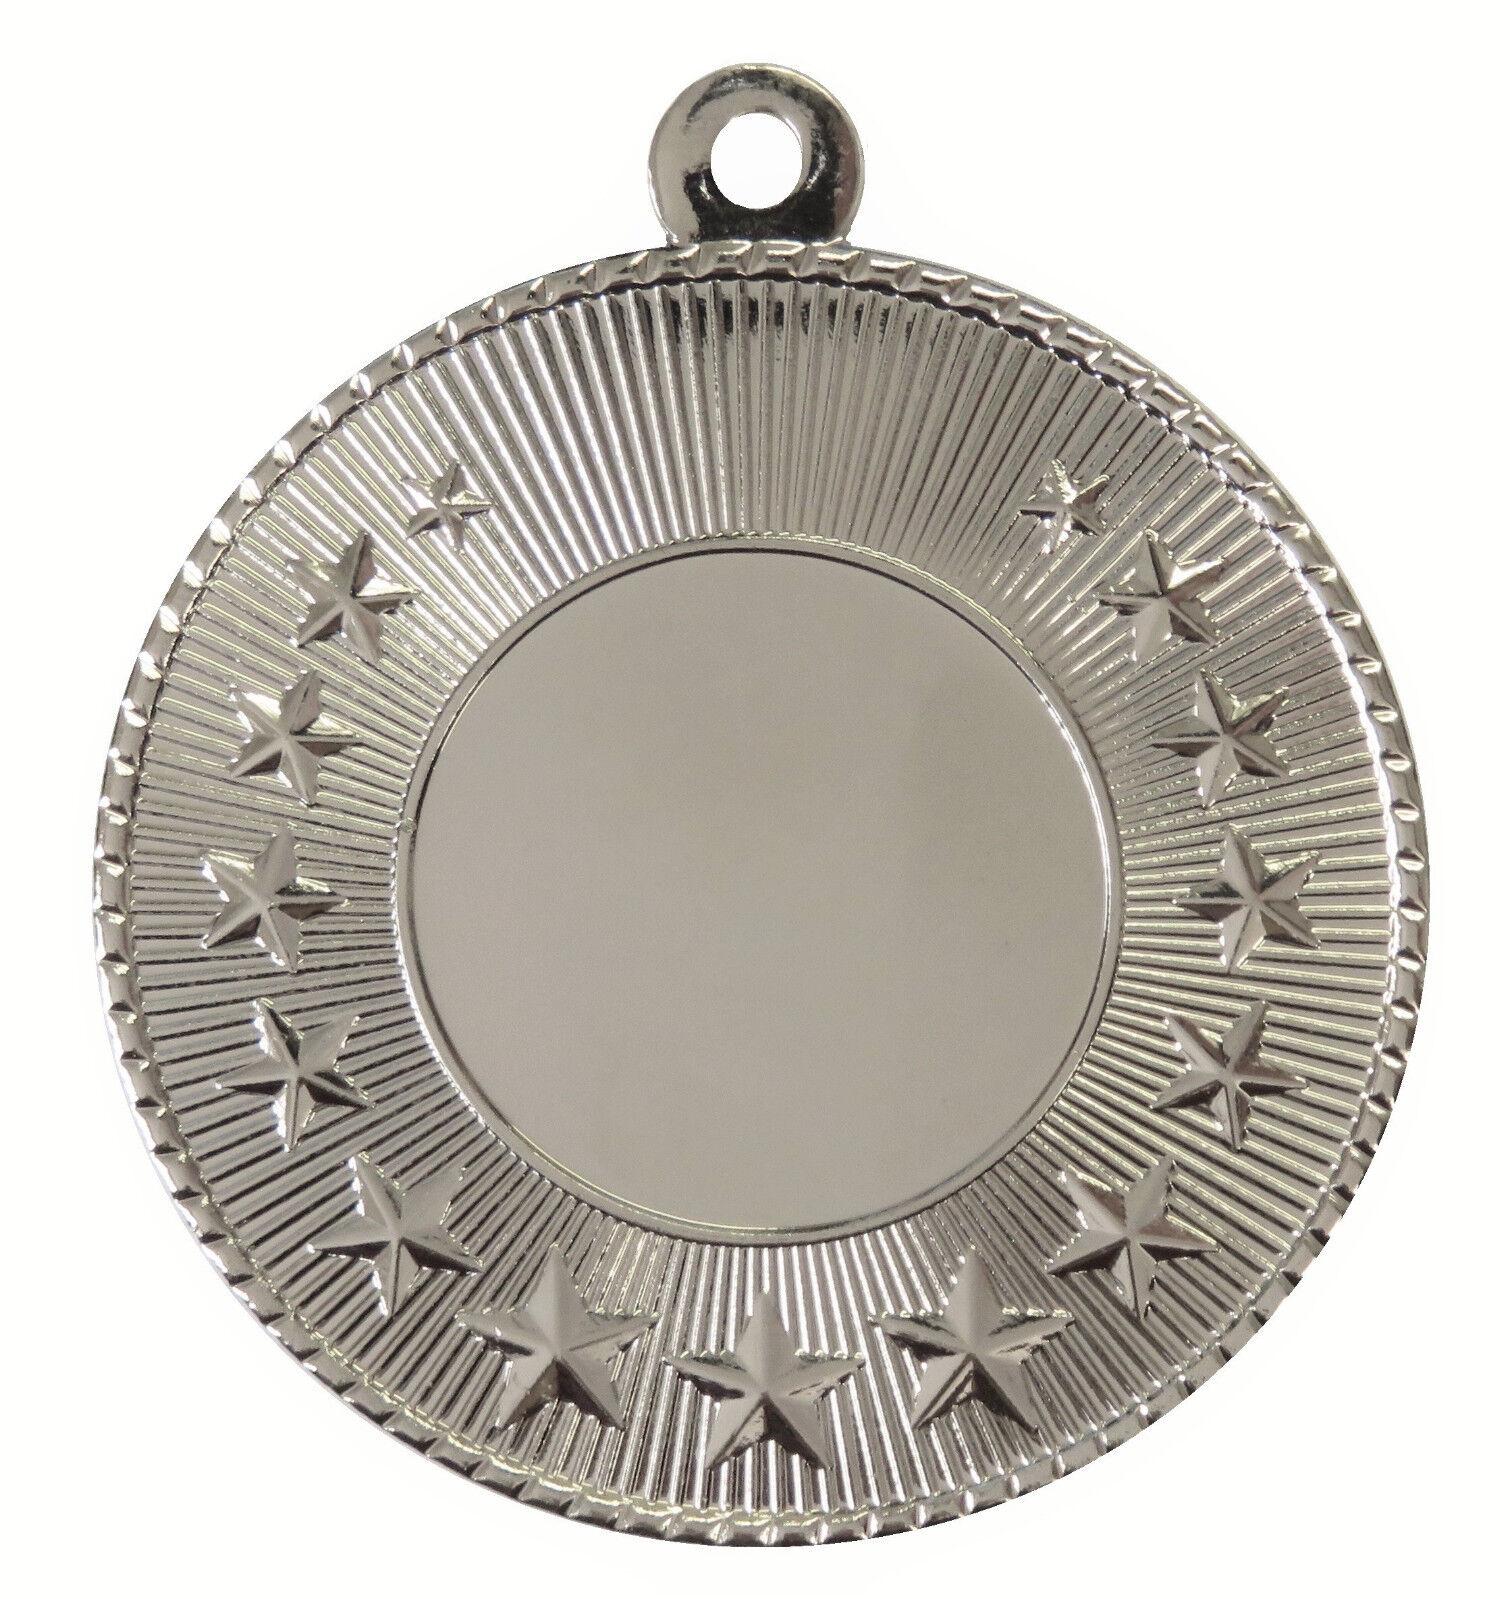 Finisher métal médailles 50 mm, mm, mm, pack de 10, rubans, insère ou propre Logo & Texte b8bcbe